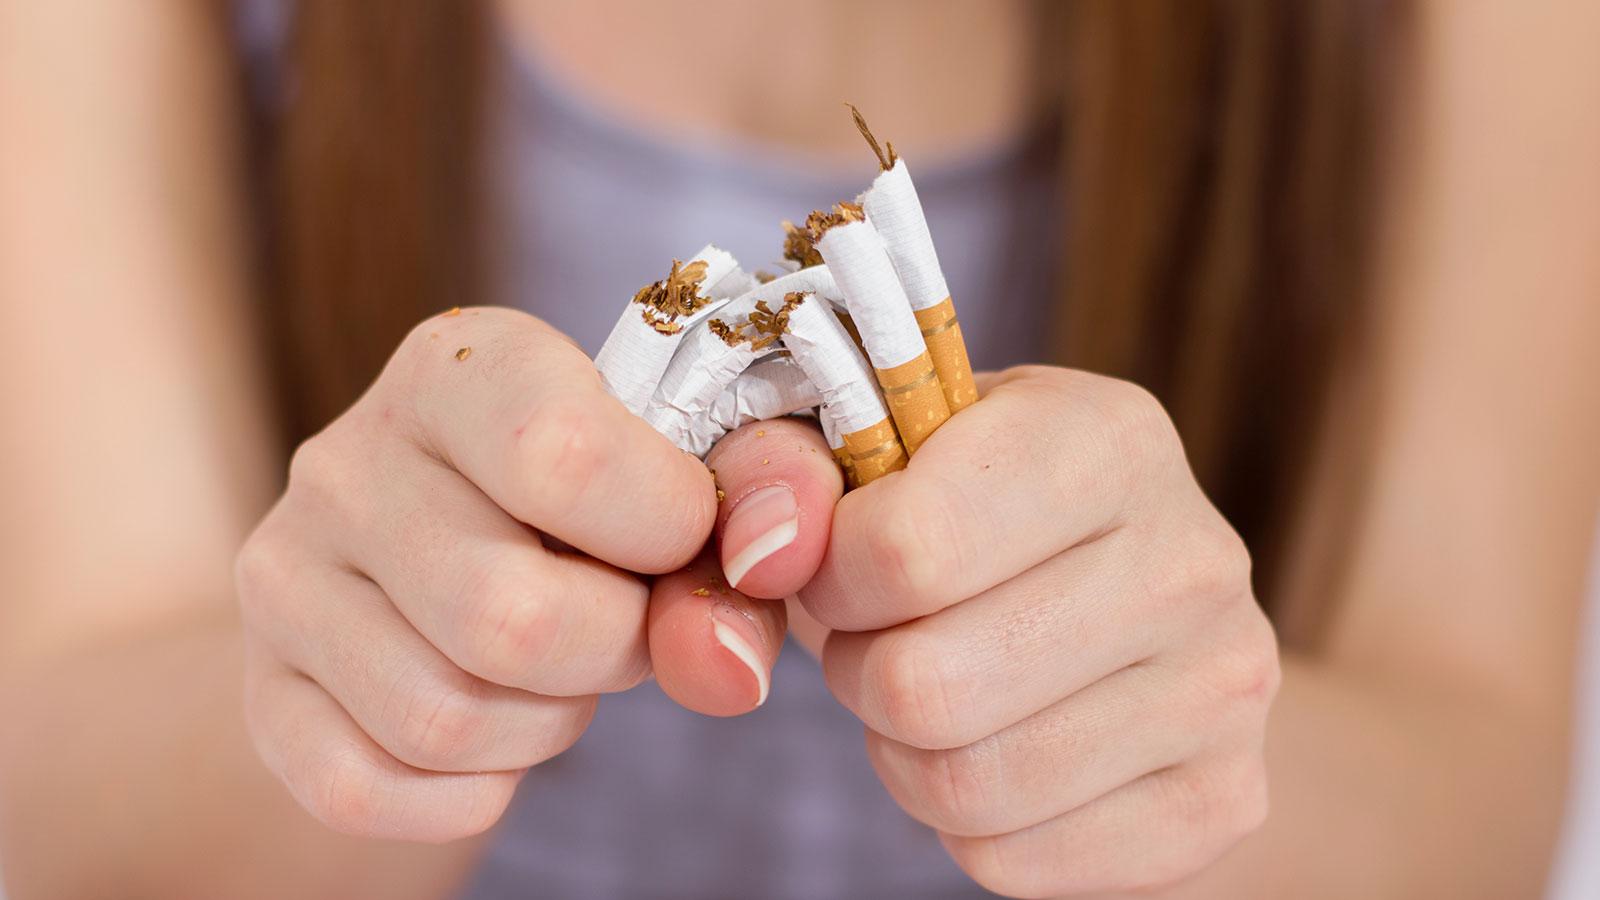 Un día sin fumar: un día para empezar a sanar